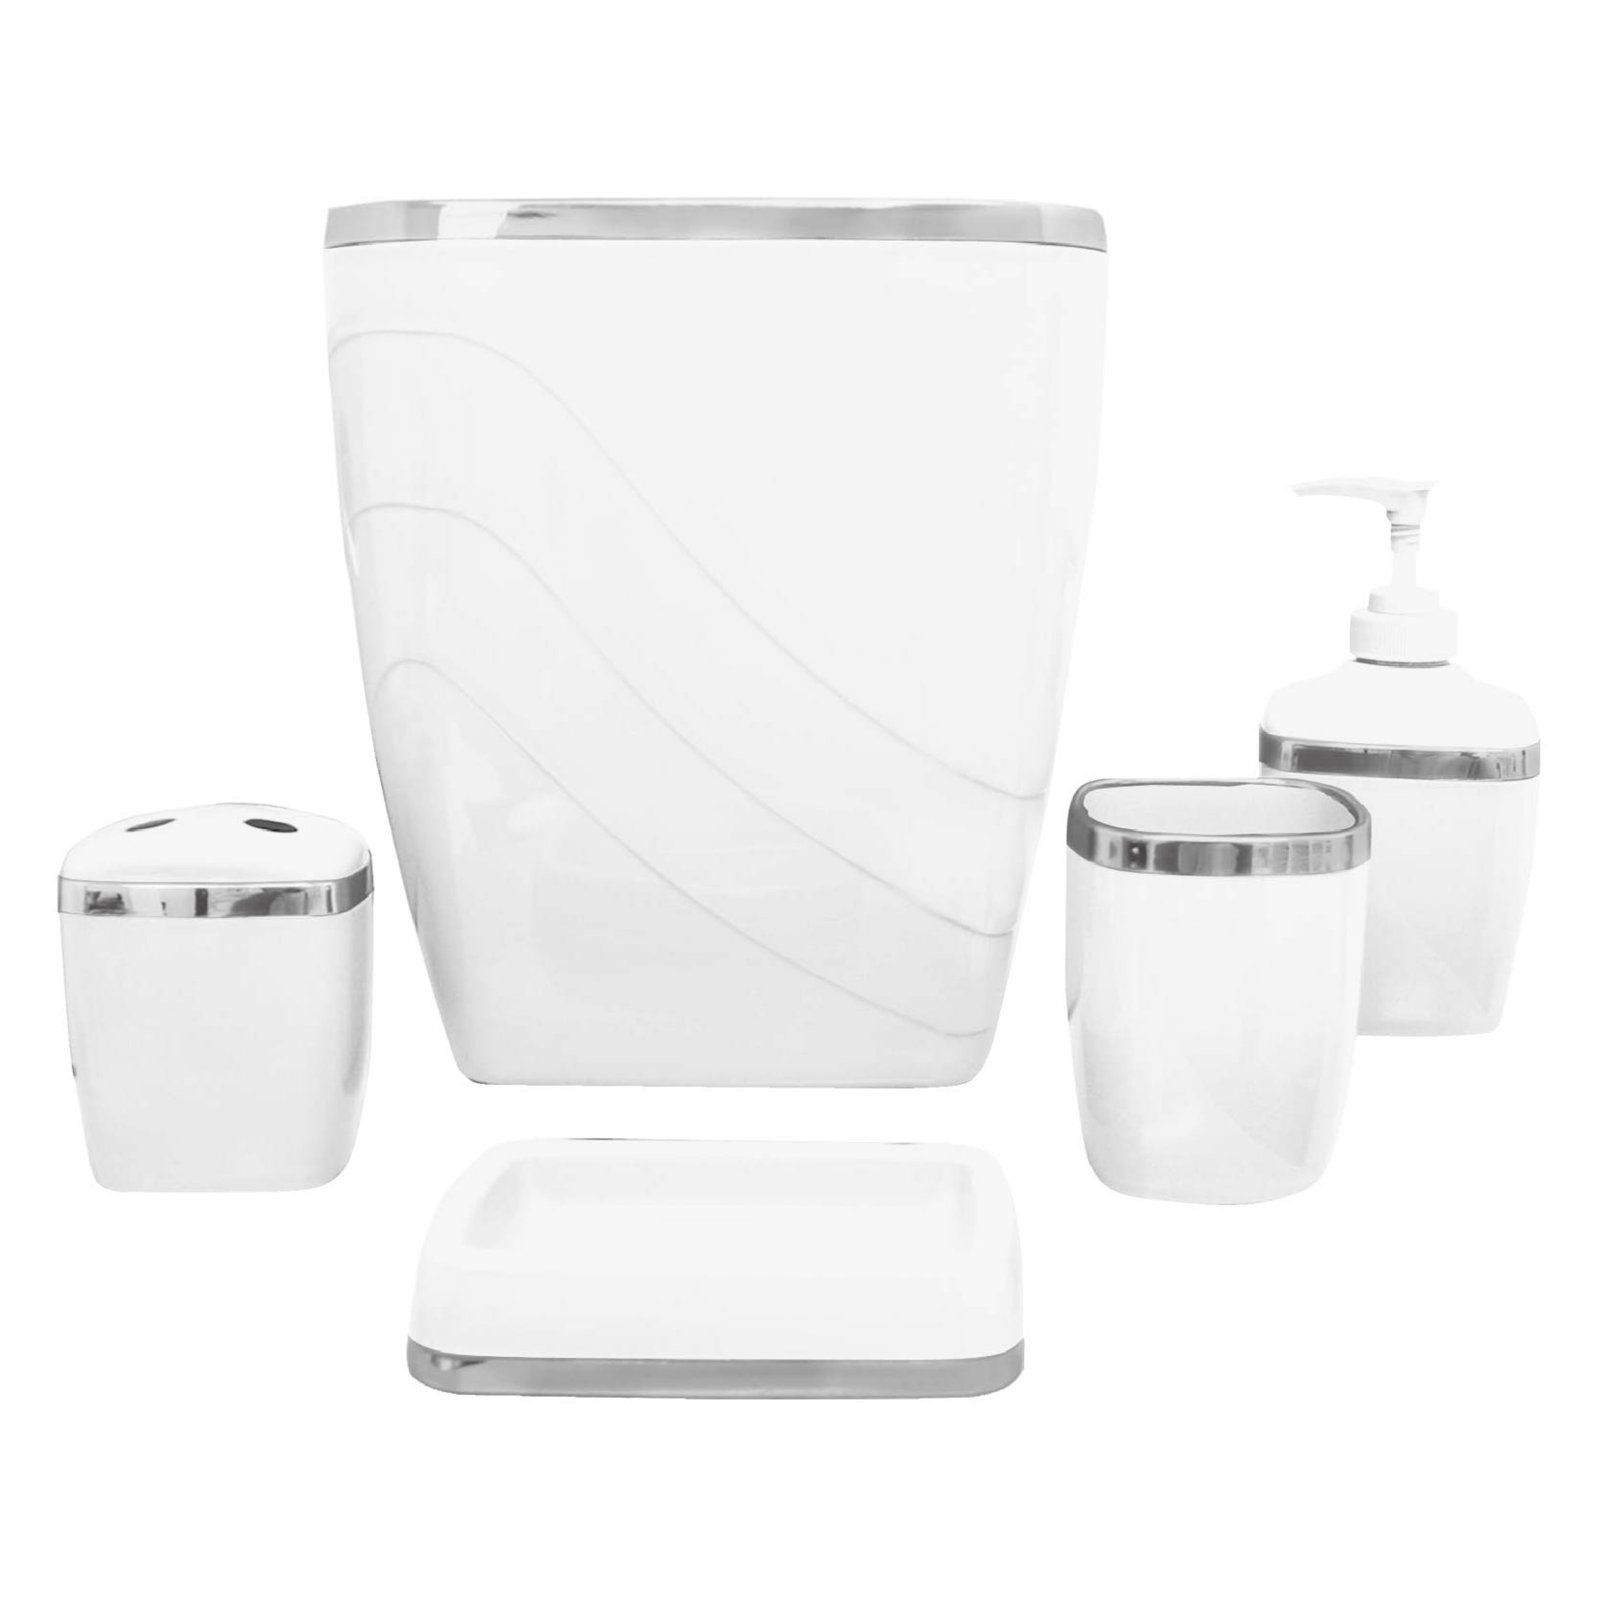 Home Gold Bathroom Accessories Bathroom Accessories Sets